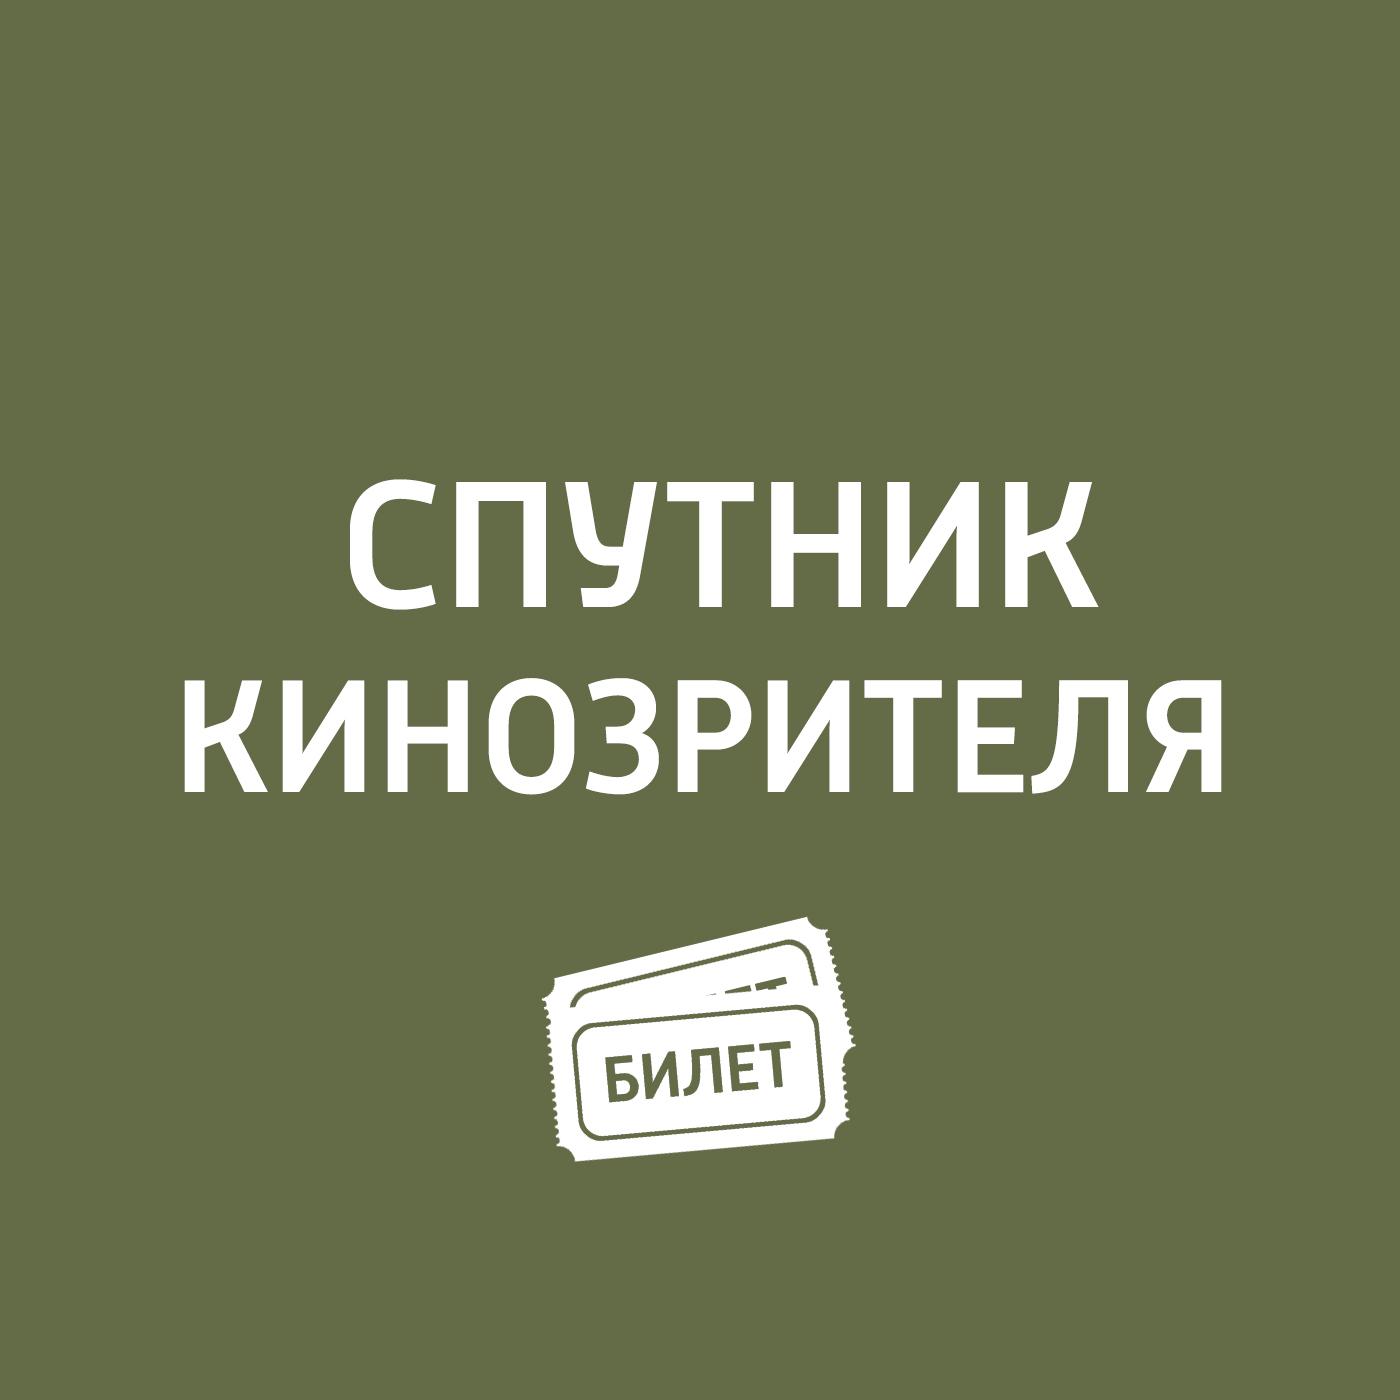 Антон Долин Итоги Каннского кинофестиваля